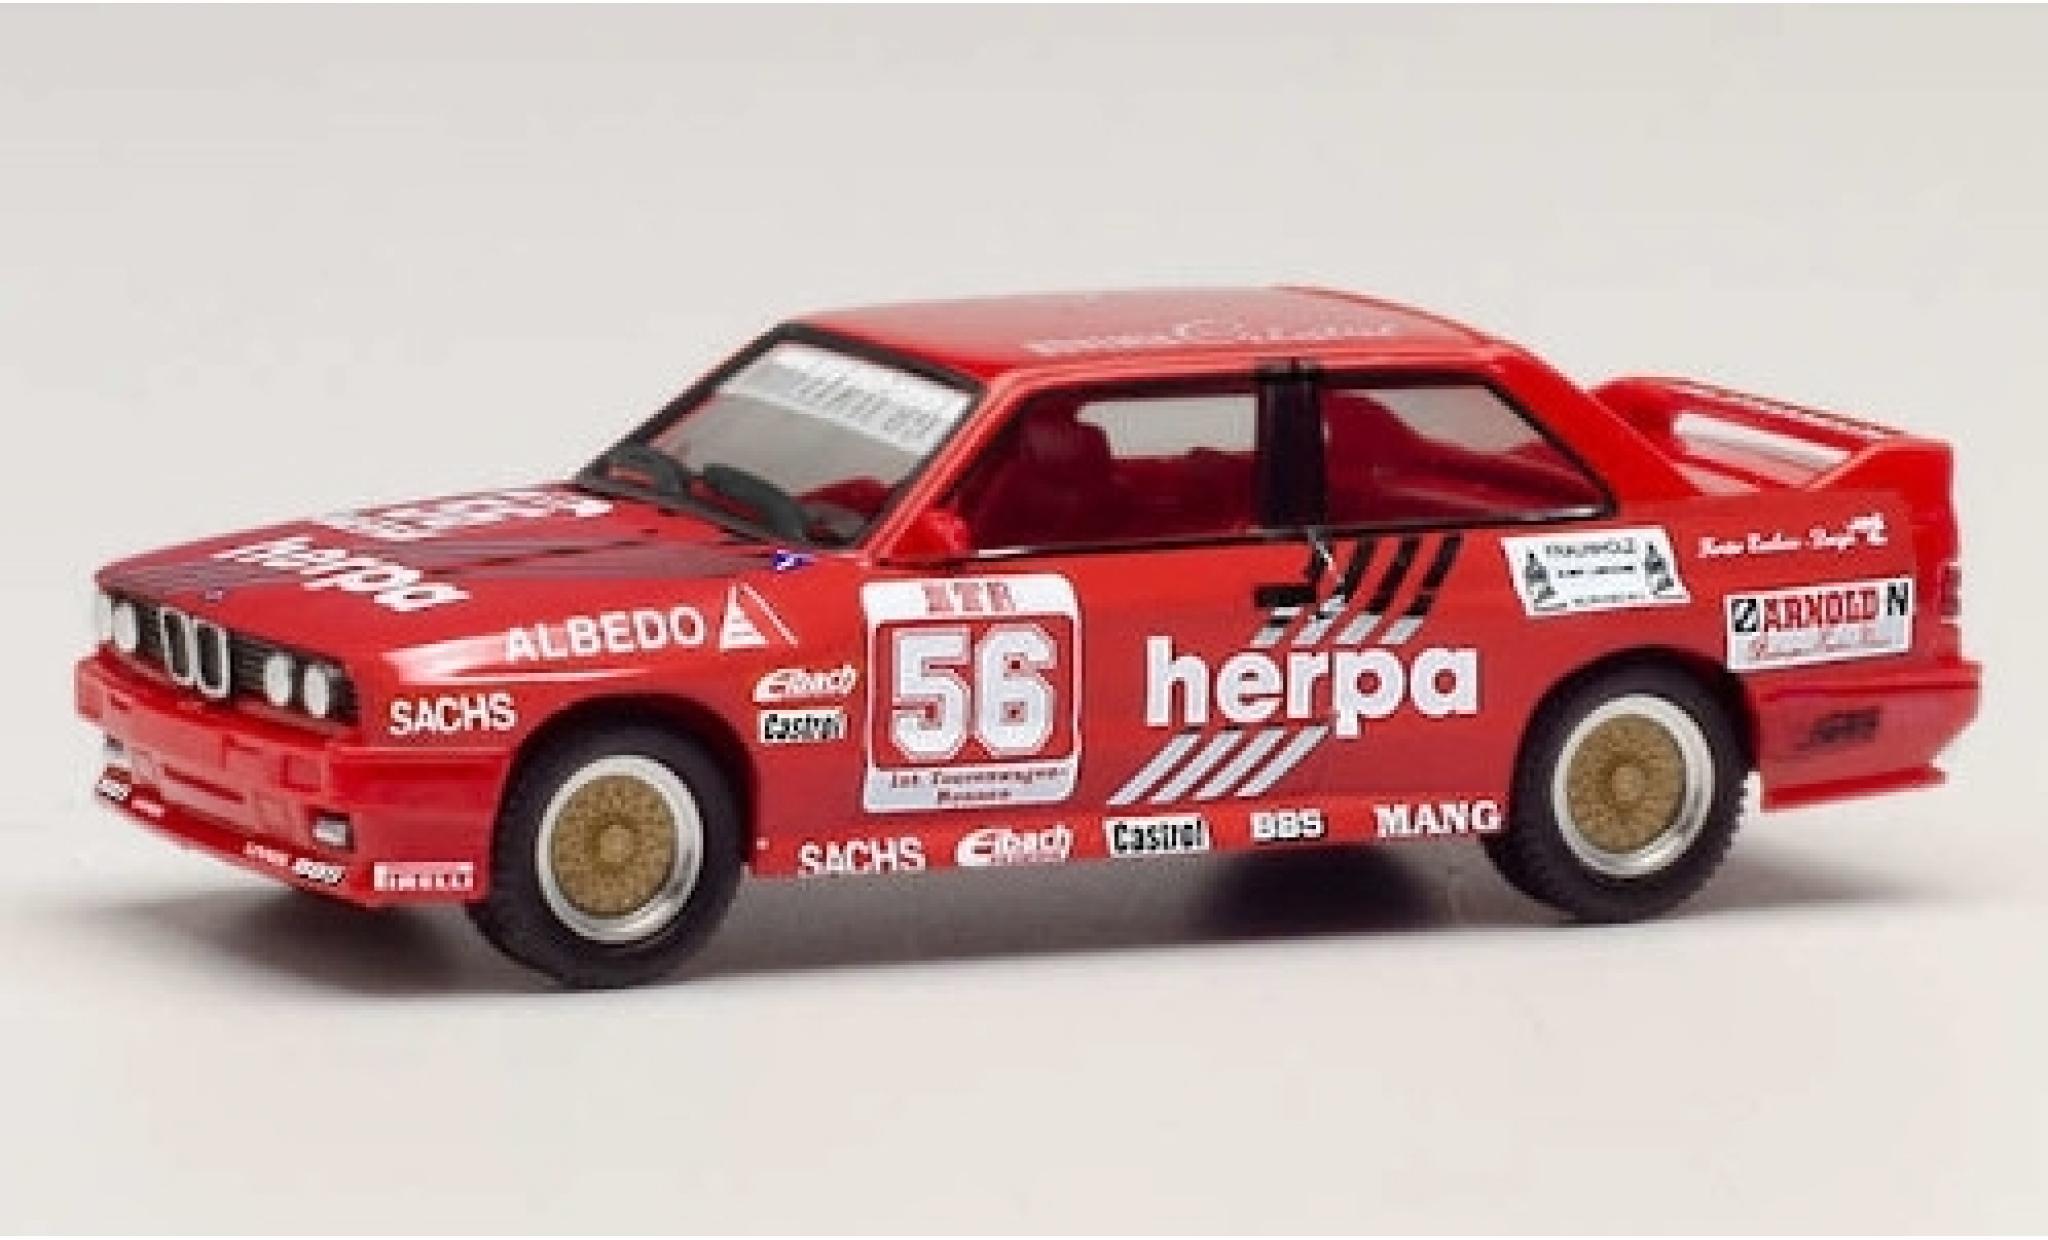 Bmw M3 1/87 Herpa (E30) No.56 Herpa Motorsport Herpa DTM 1989 G.Müller